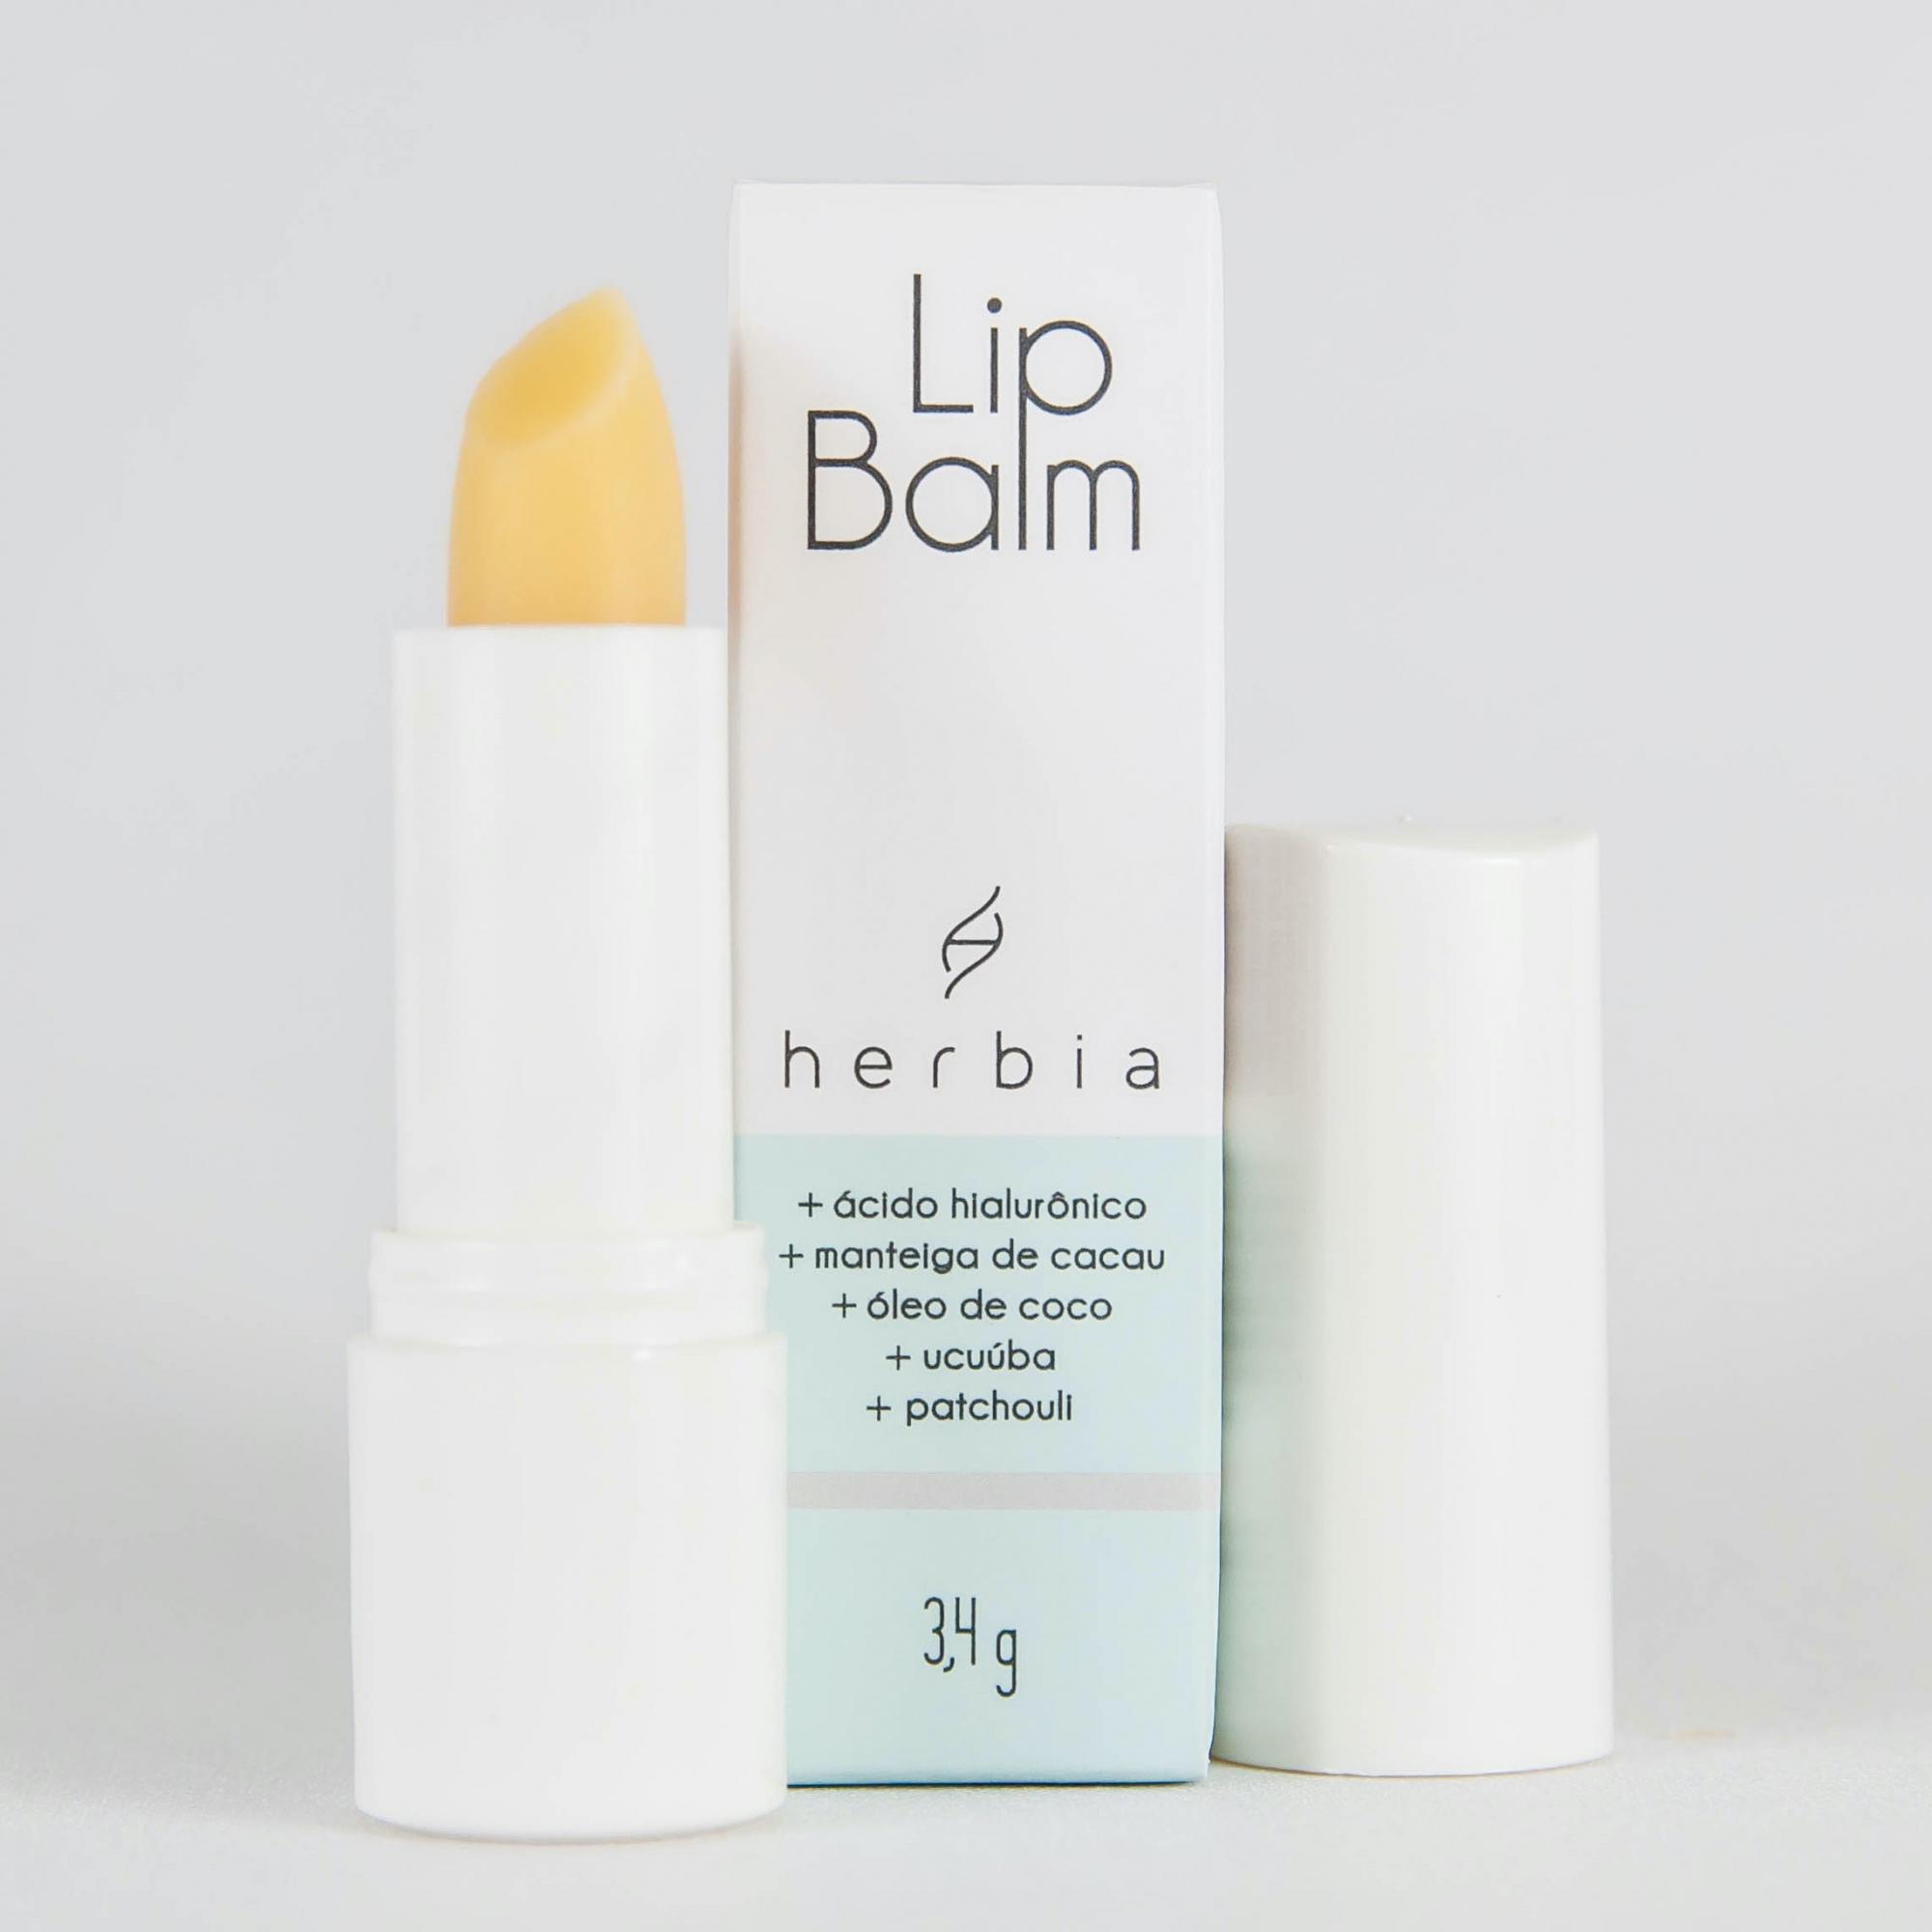 Lip Balm com Ácido Hialurônico